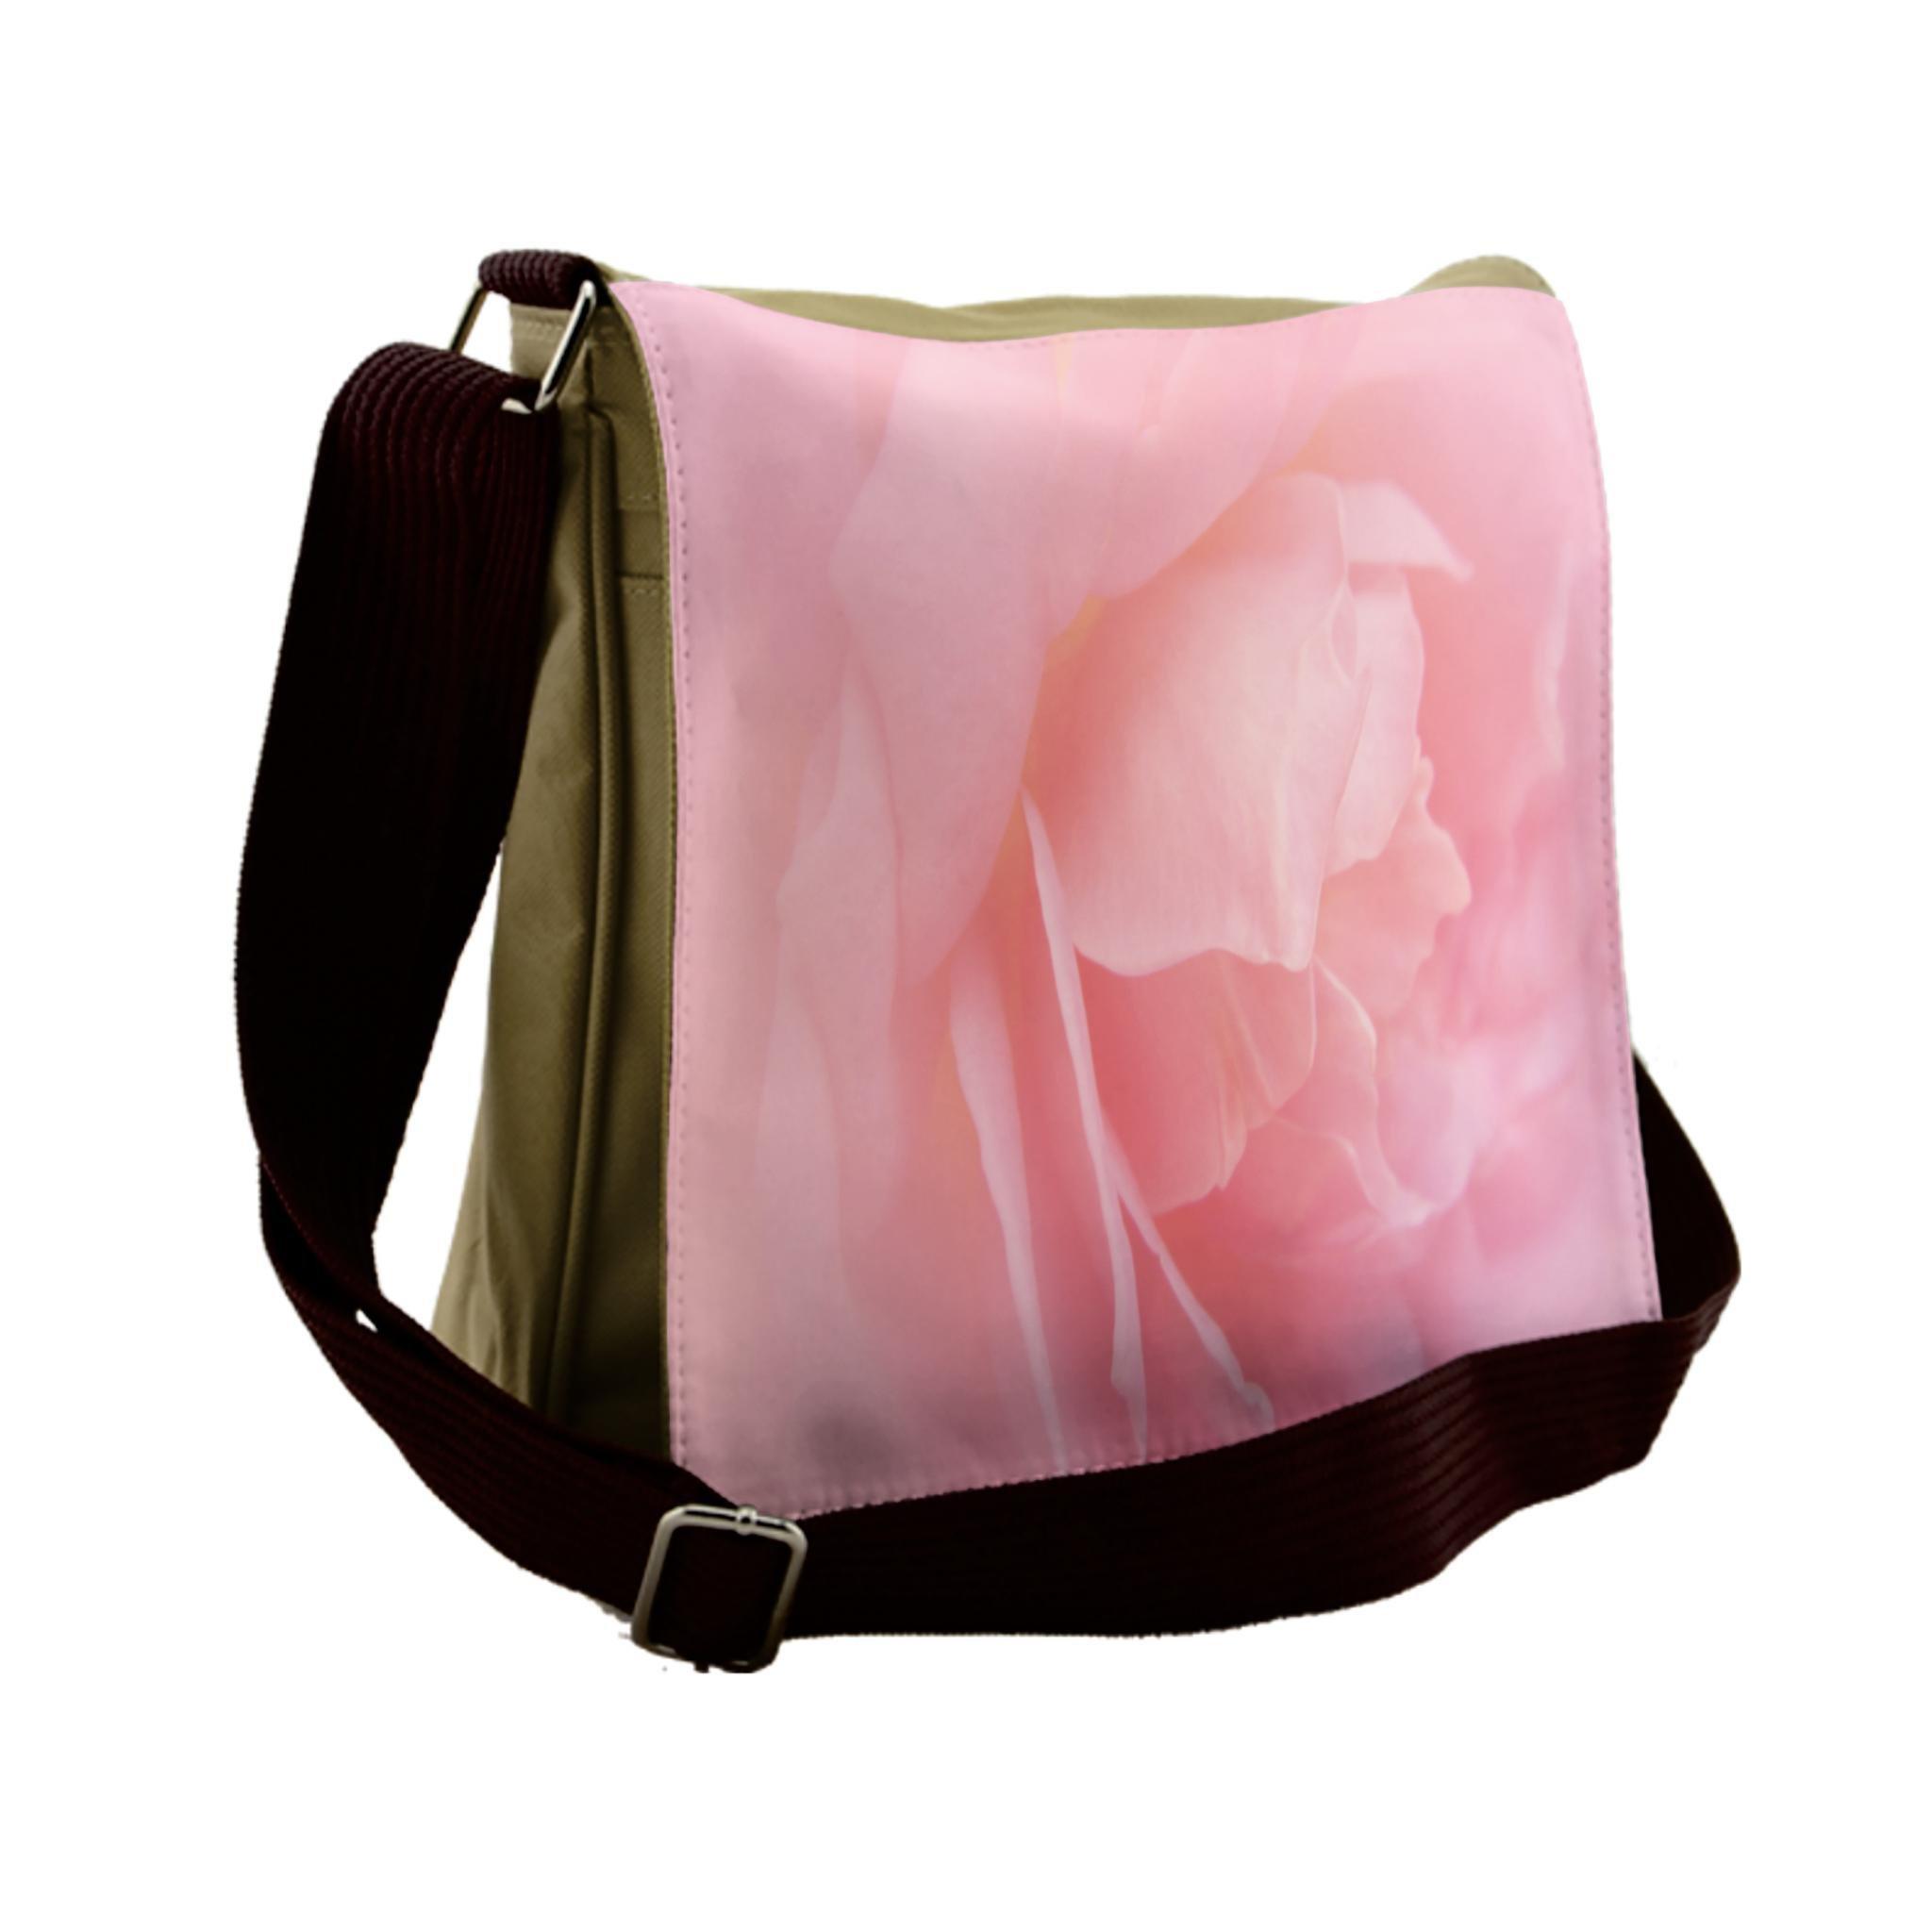 Lunarable Pale Pink Messenger Bag, Wedding Inspired Love, Unisex Cross-body